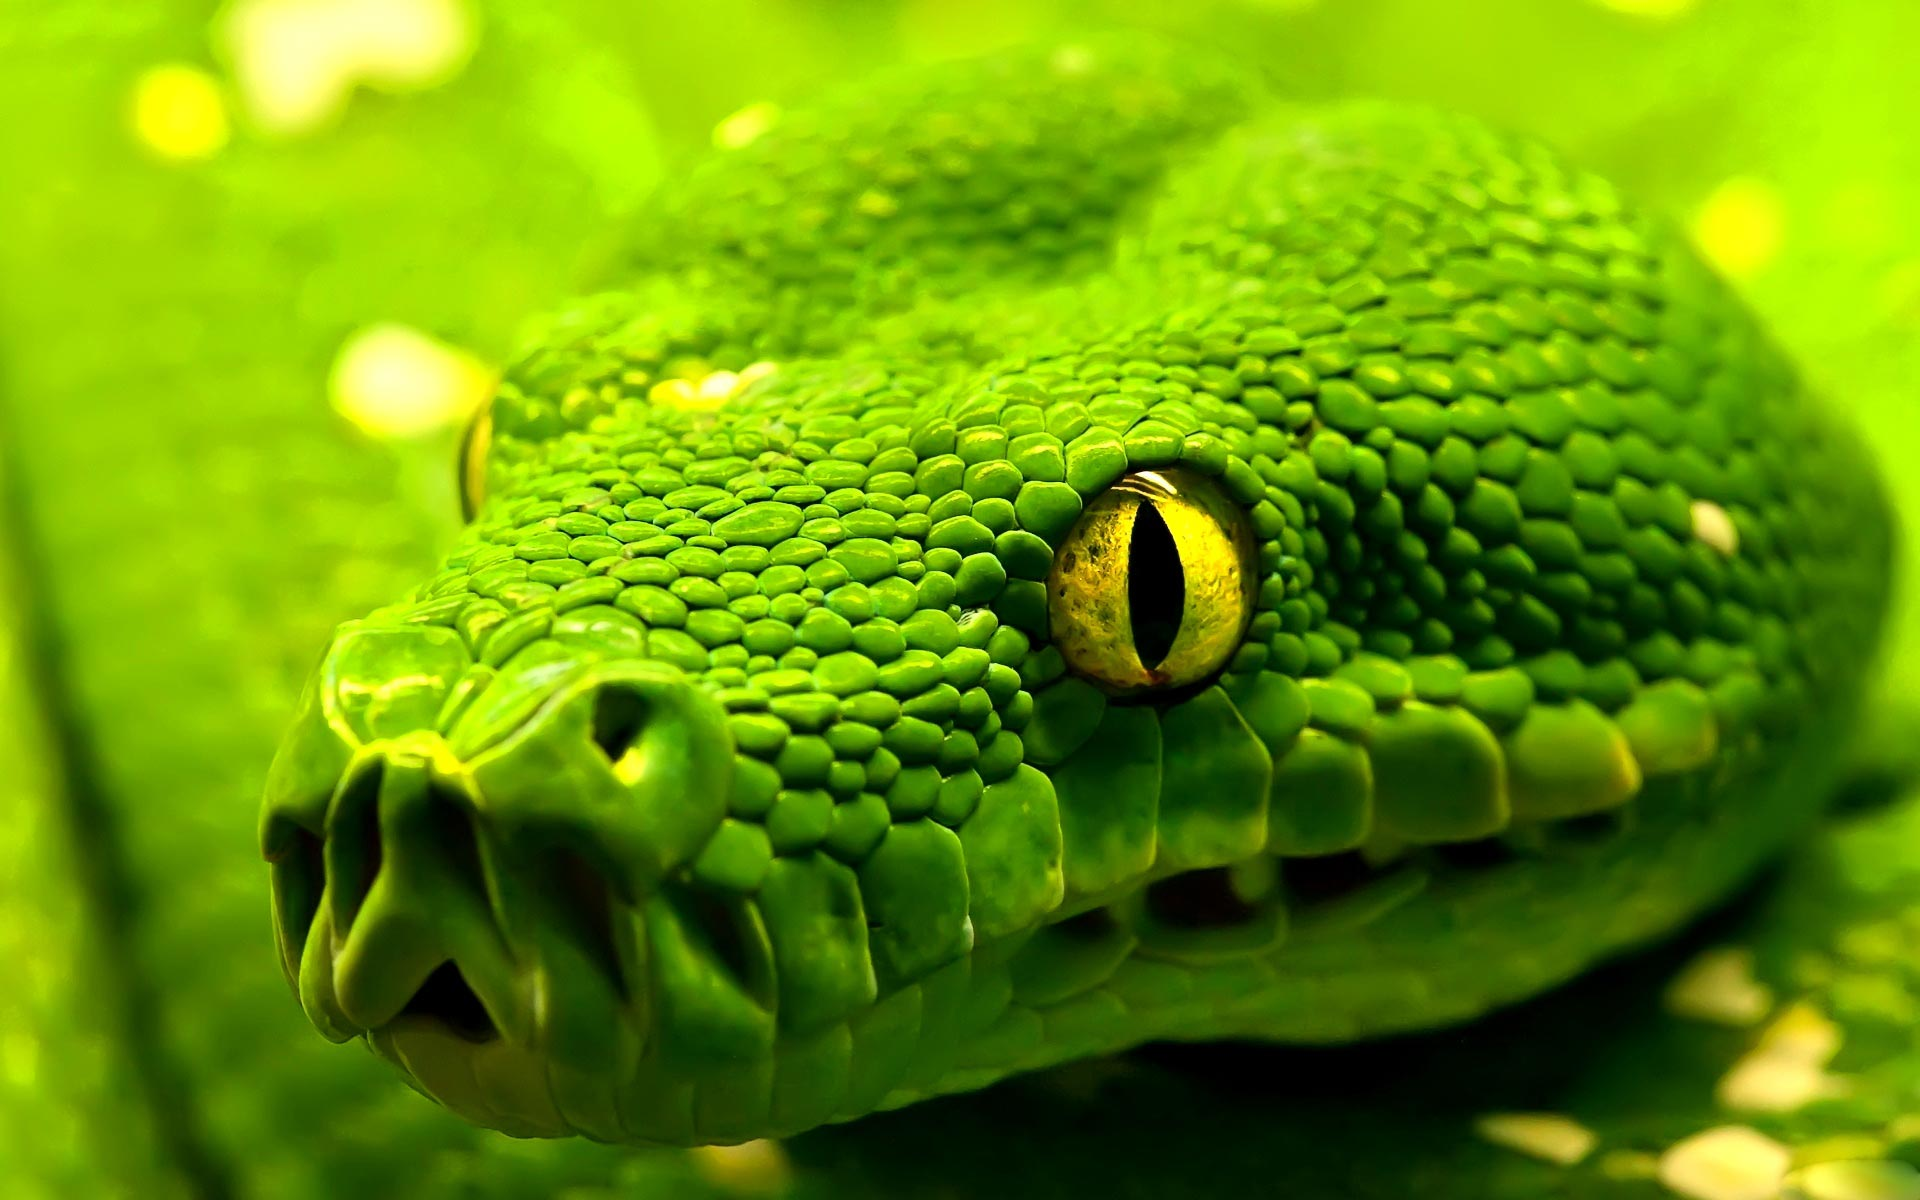 beautiful-green-snake-hd-wallpapers-cool-desktop-background-images-widescreen